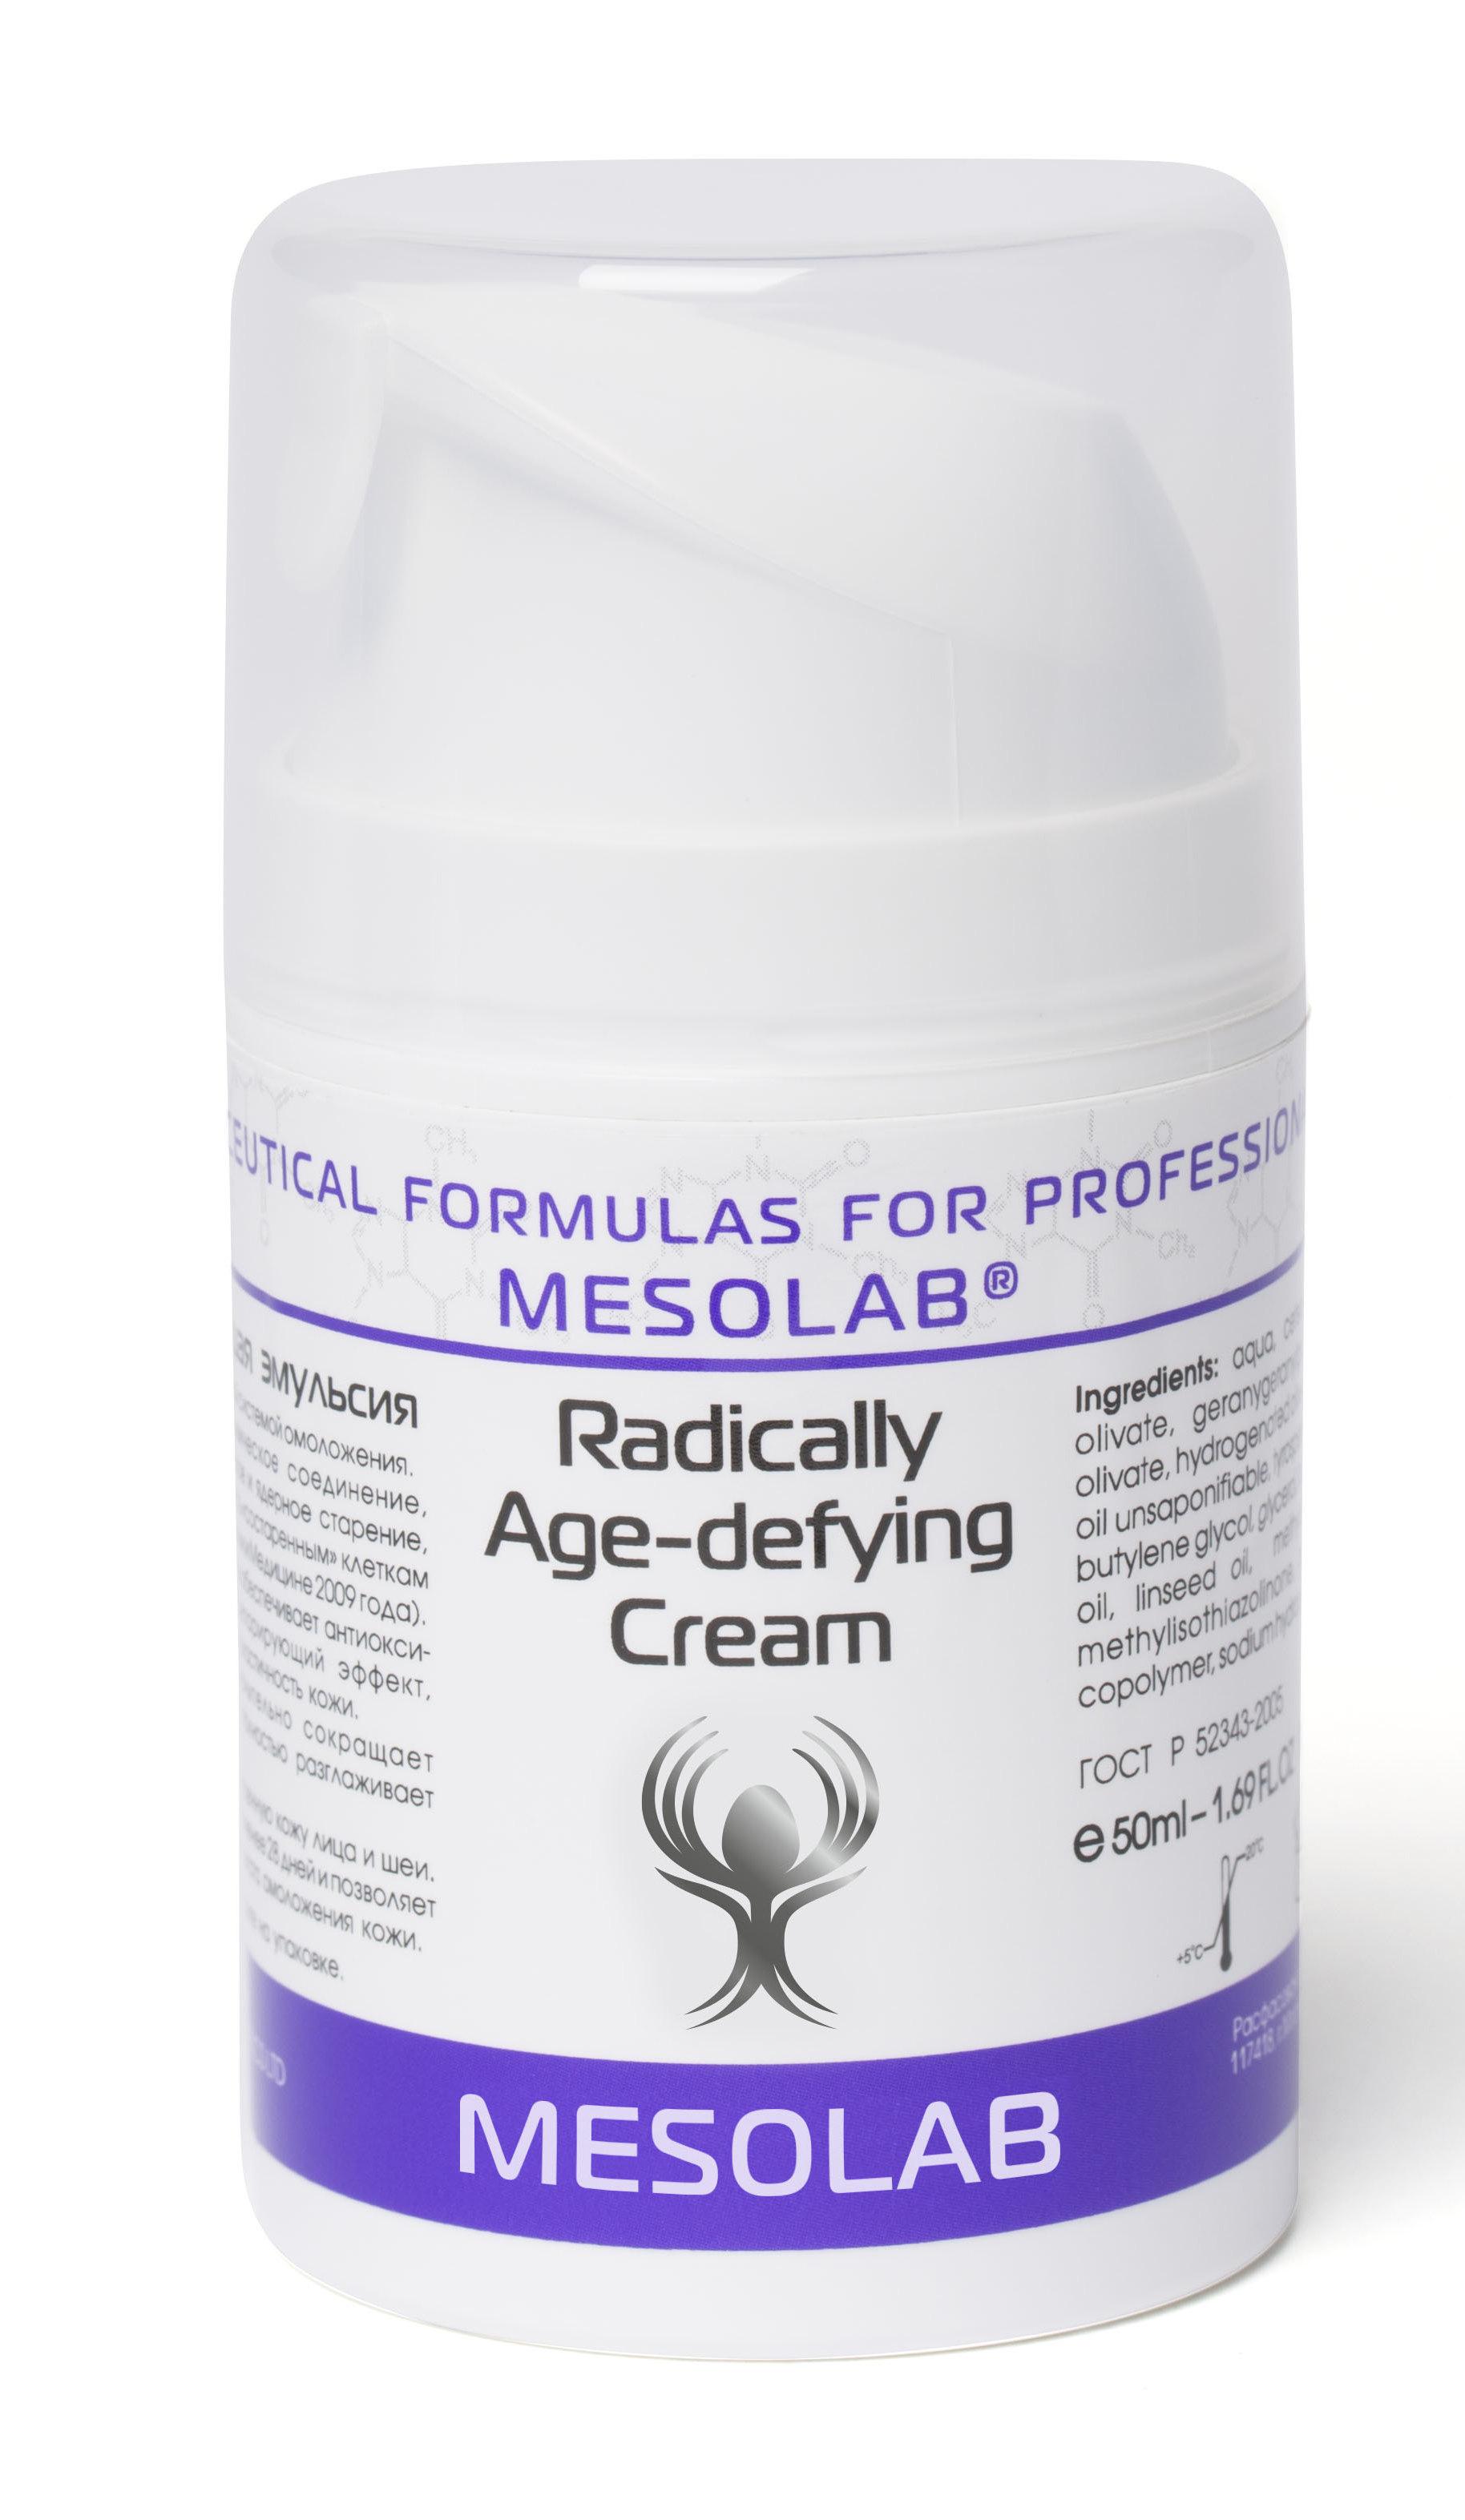 MESOLAB Крем возраждающая эмульсия / RADICALLY AGE-DEFYING CREAM 50 мл -  Кремы